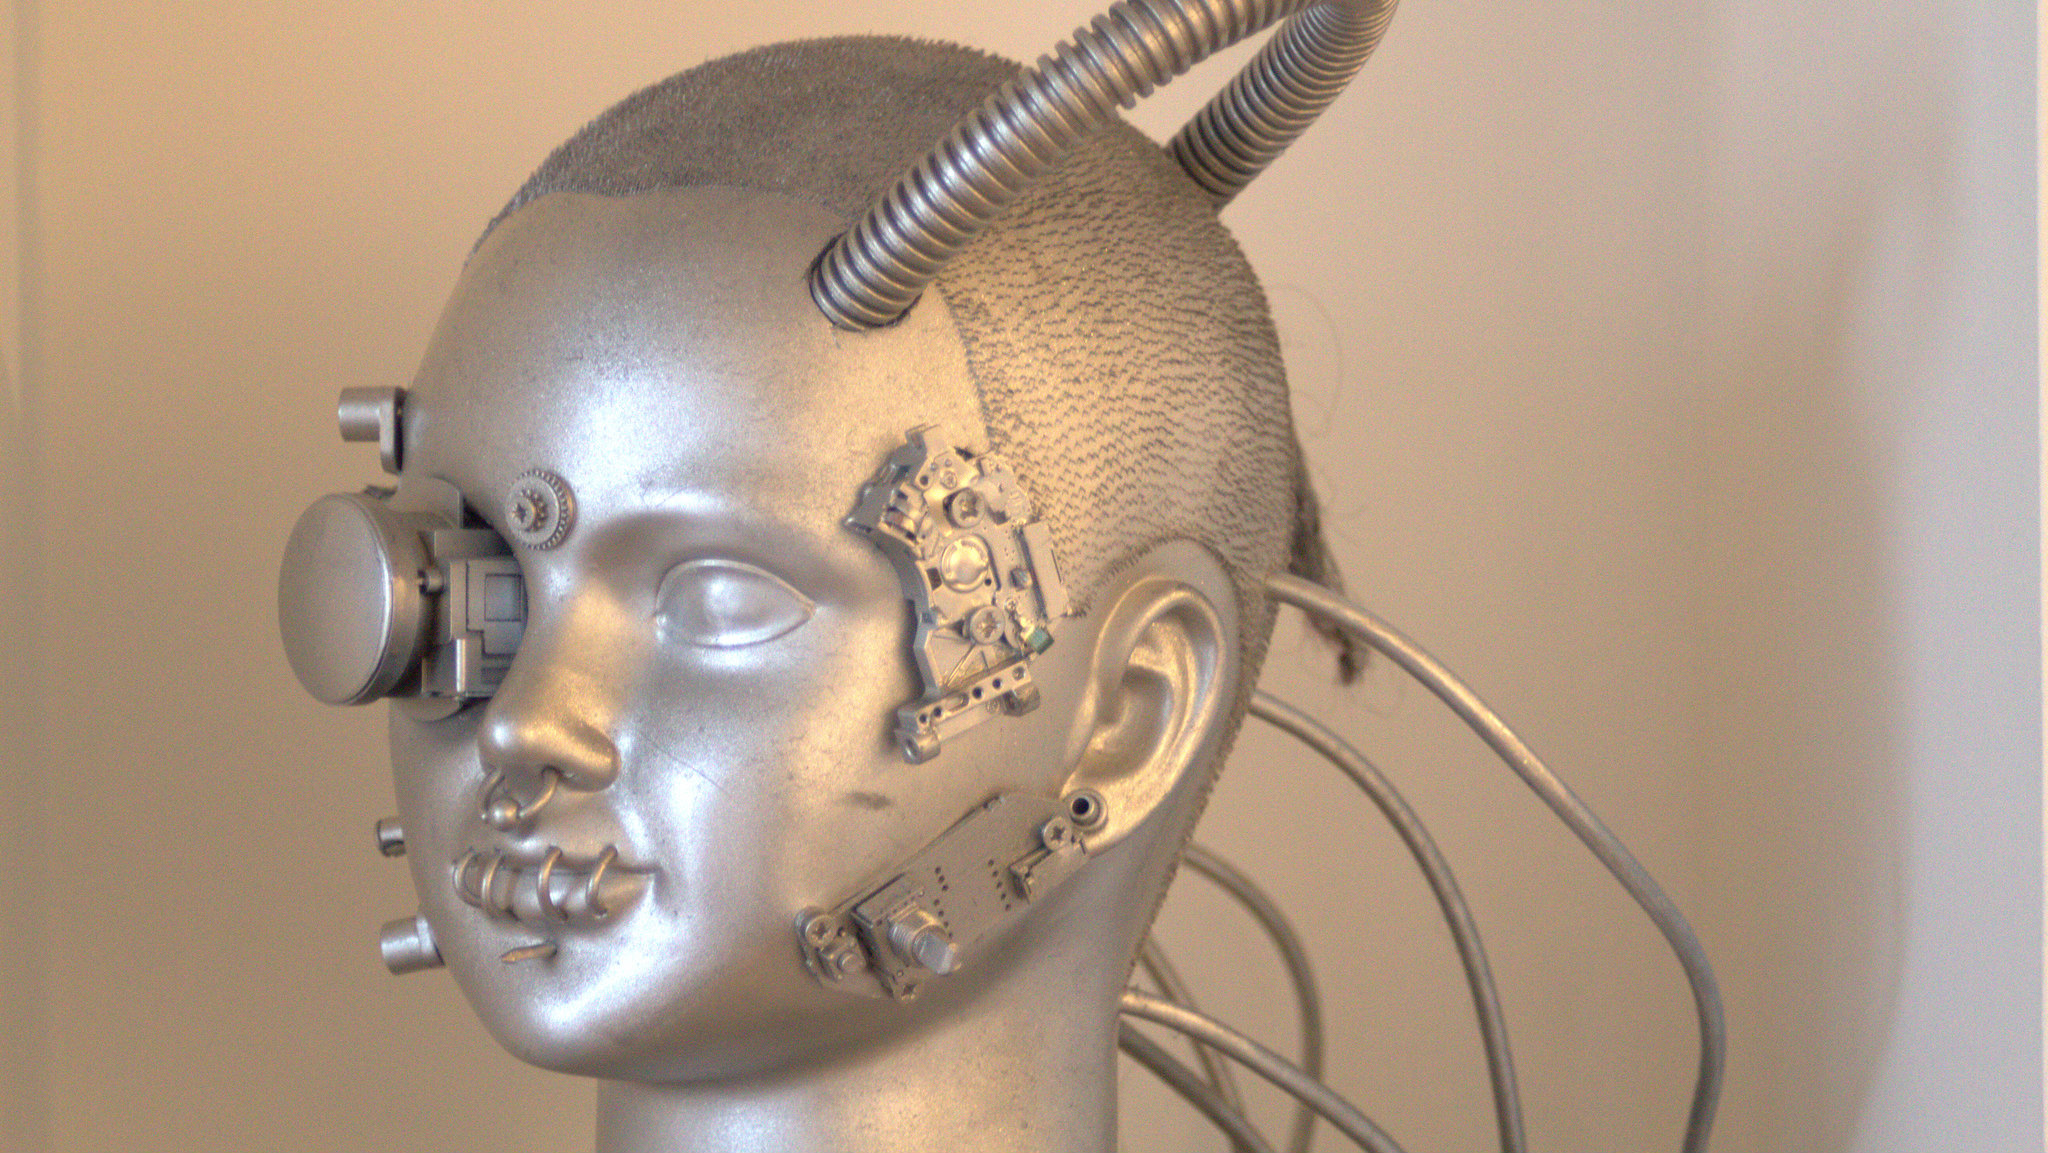 artificial_intelligene_extinct_or_superhuman